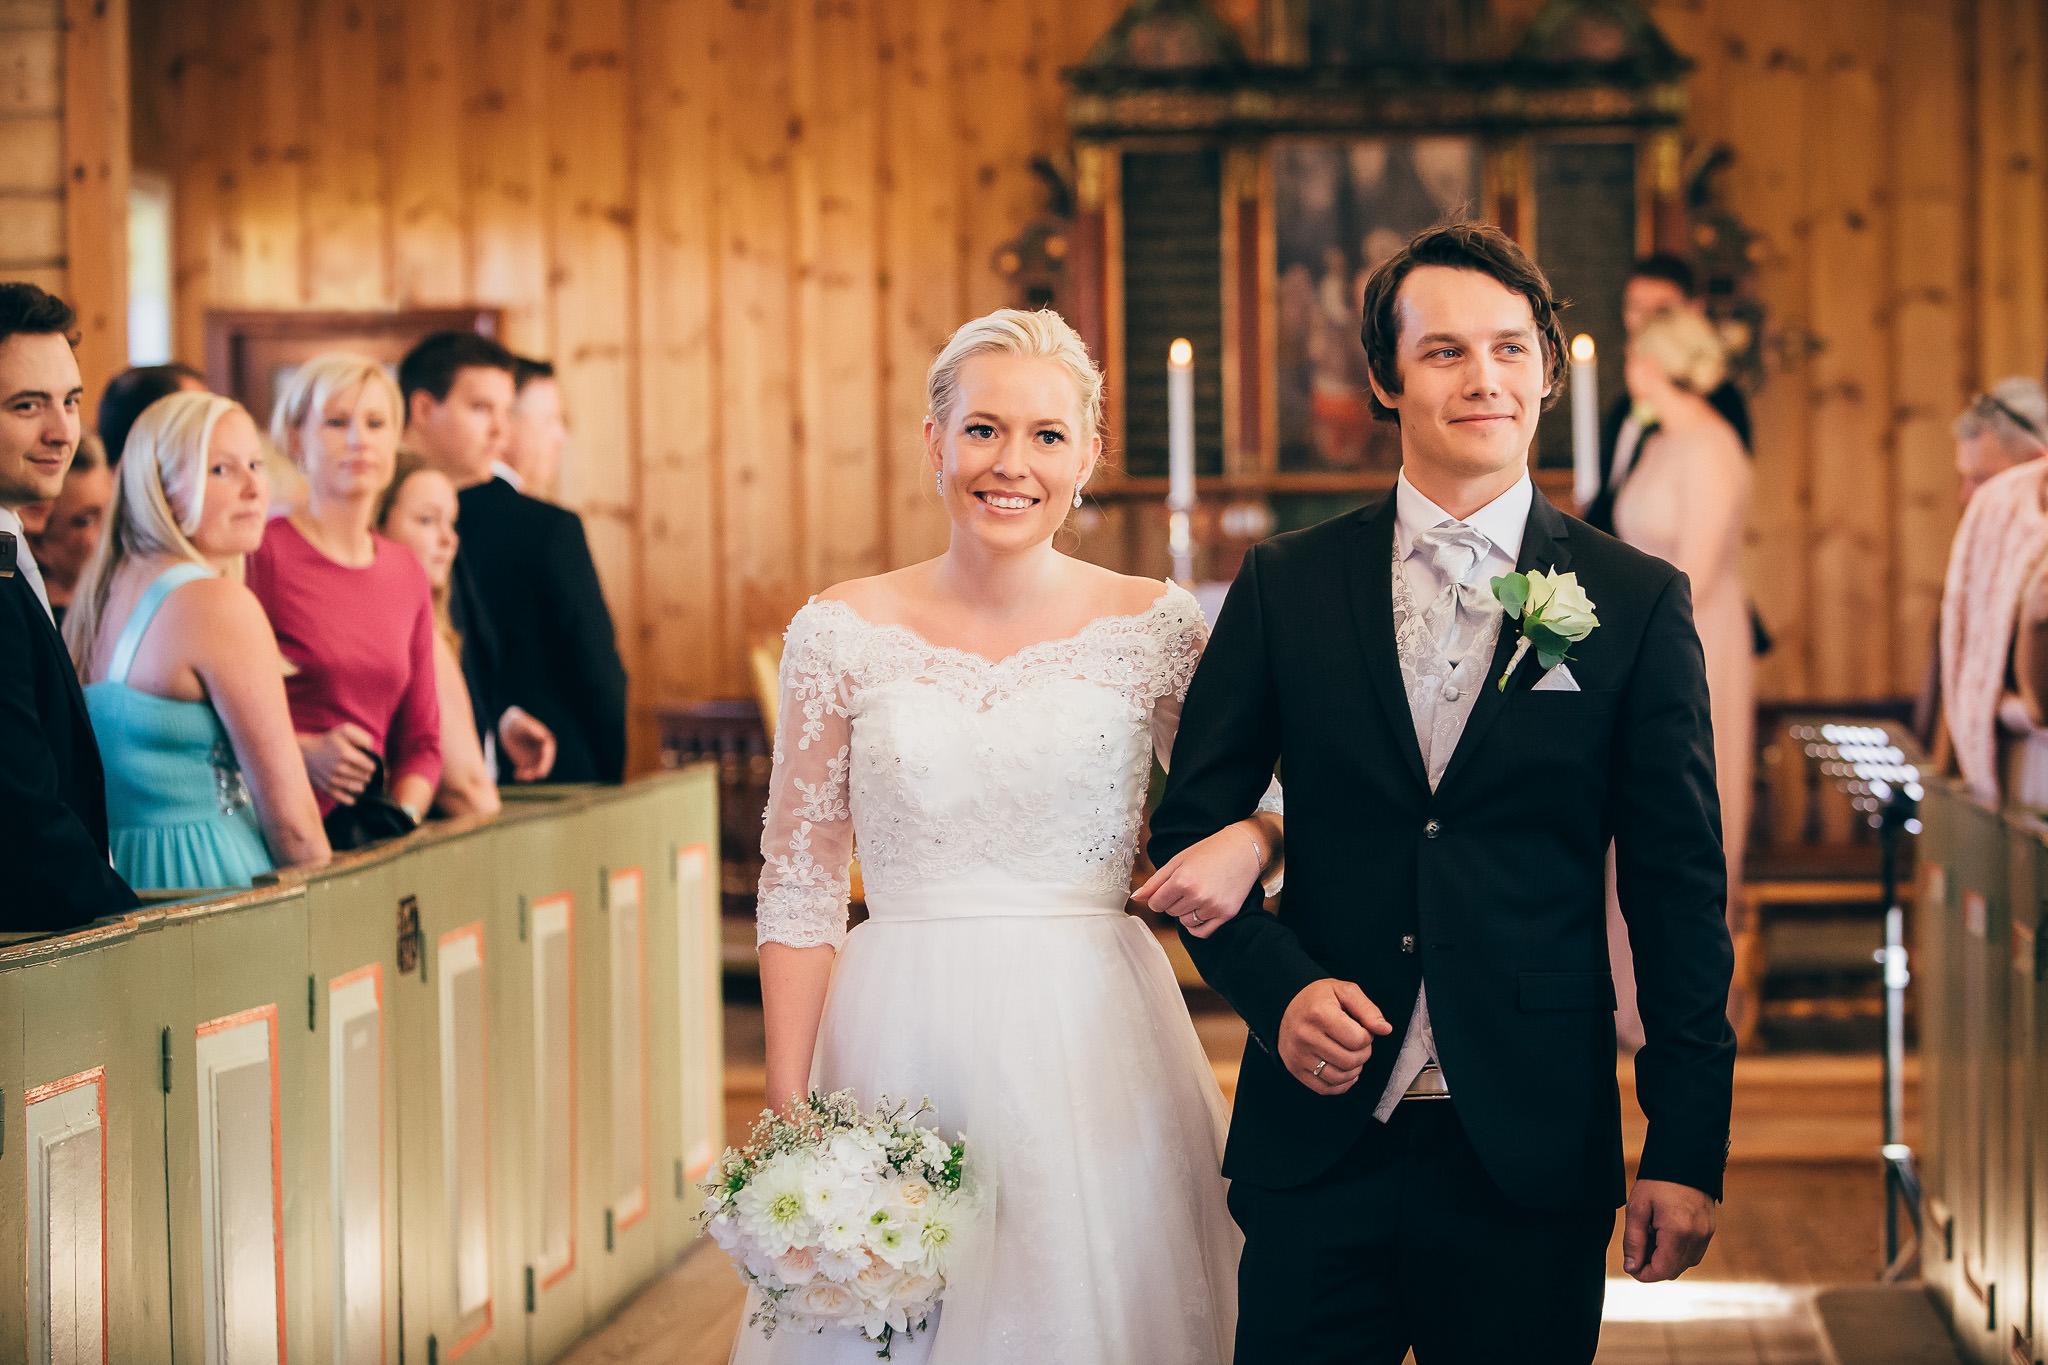 Wedding+Photographer+Norway+Bryllupsfotograf+Casey+Arneson+JT-65.jpg